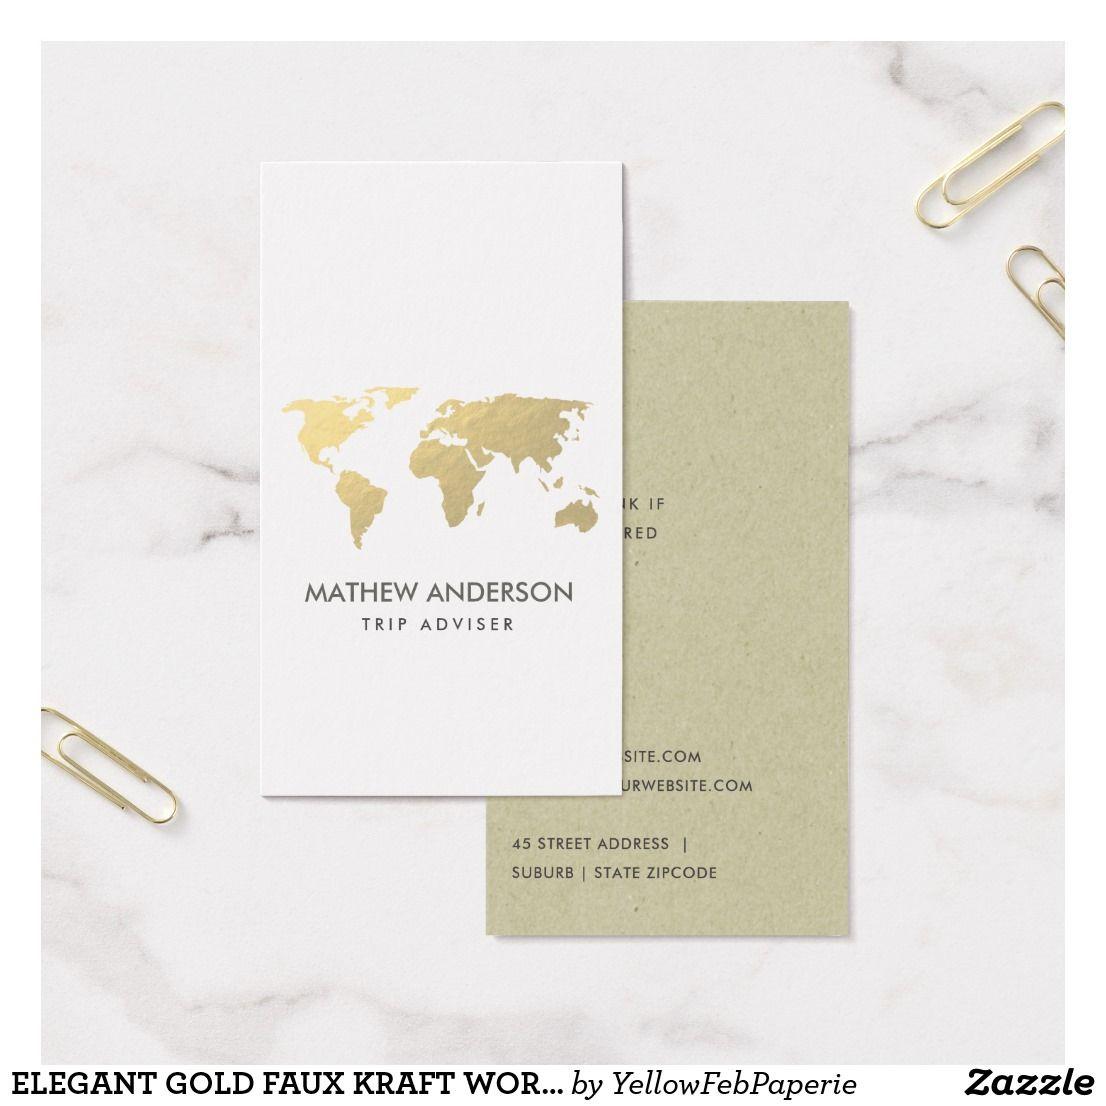 Elegant gold faux kraft world map personalised business card retro elegant gold faux kraft world map personalised business card reheart Choice Image